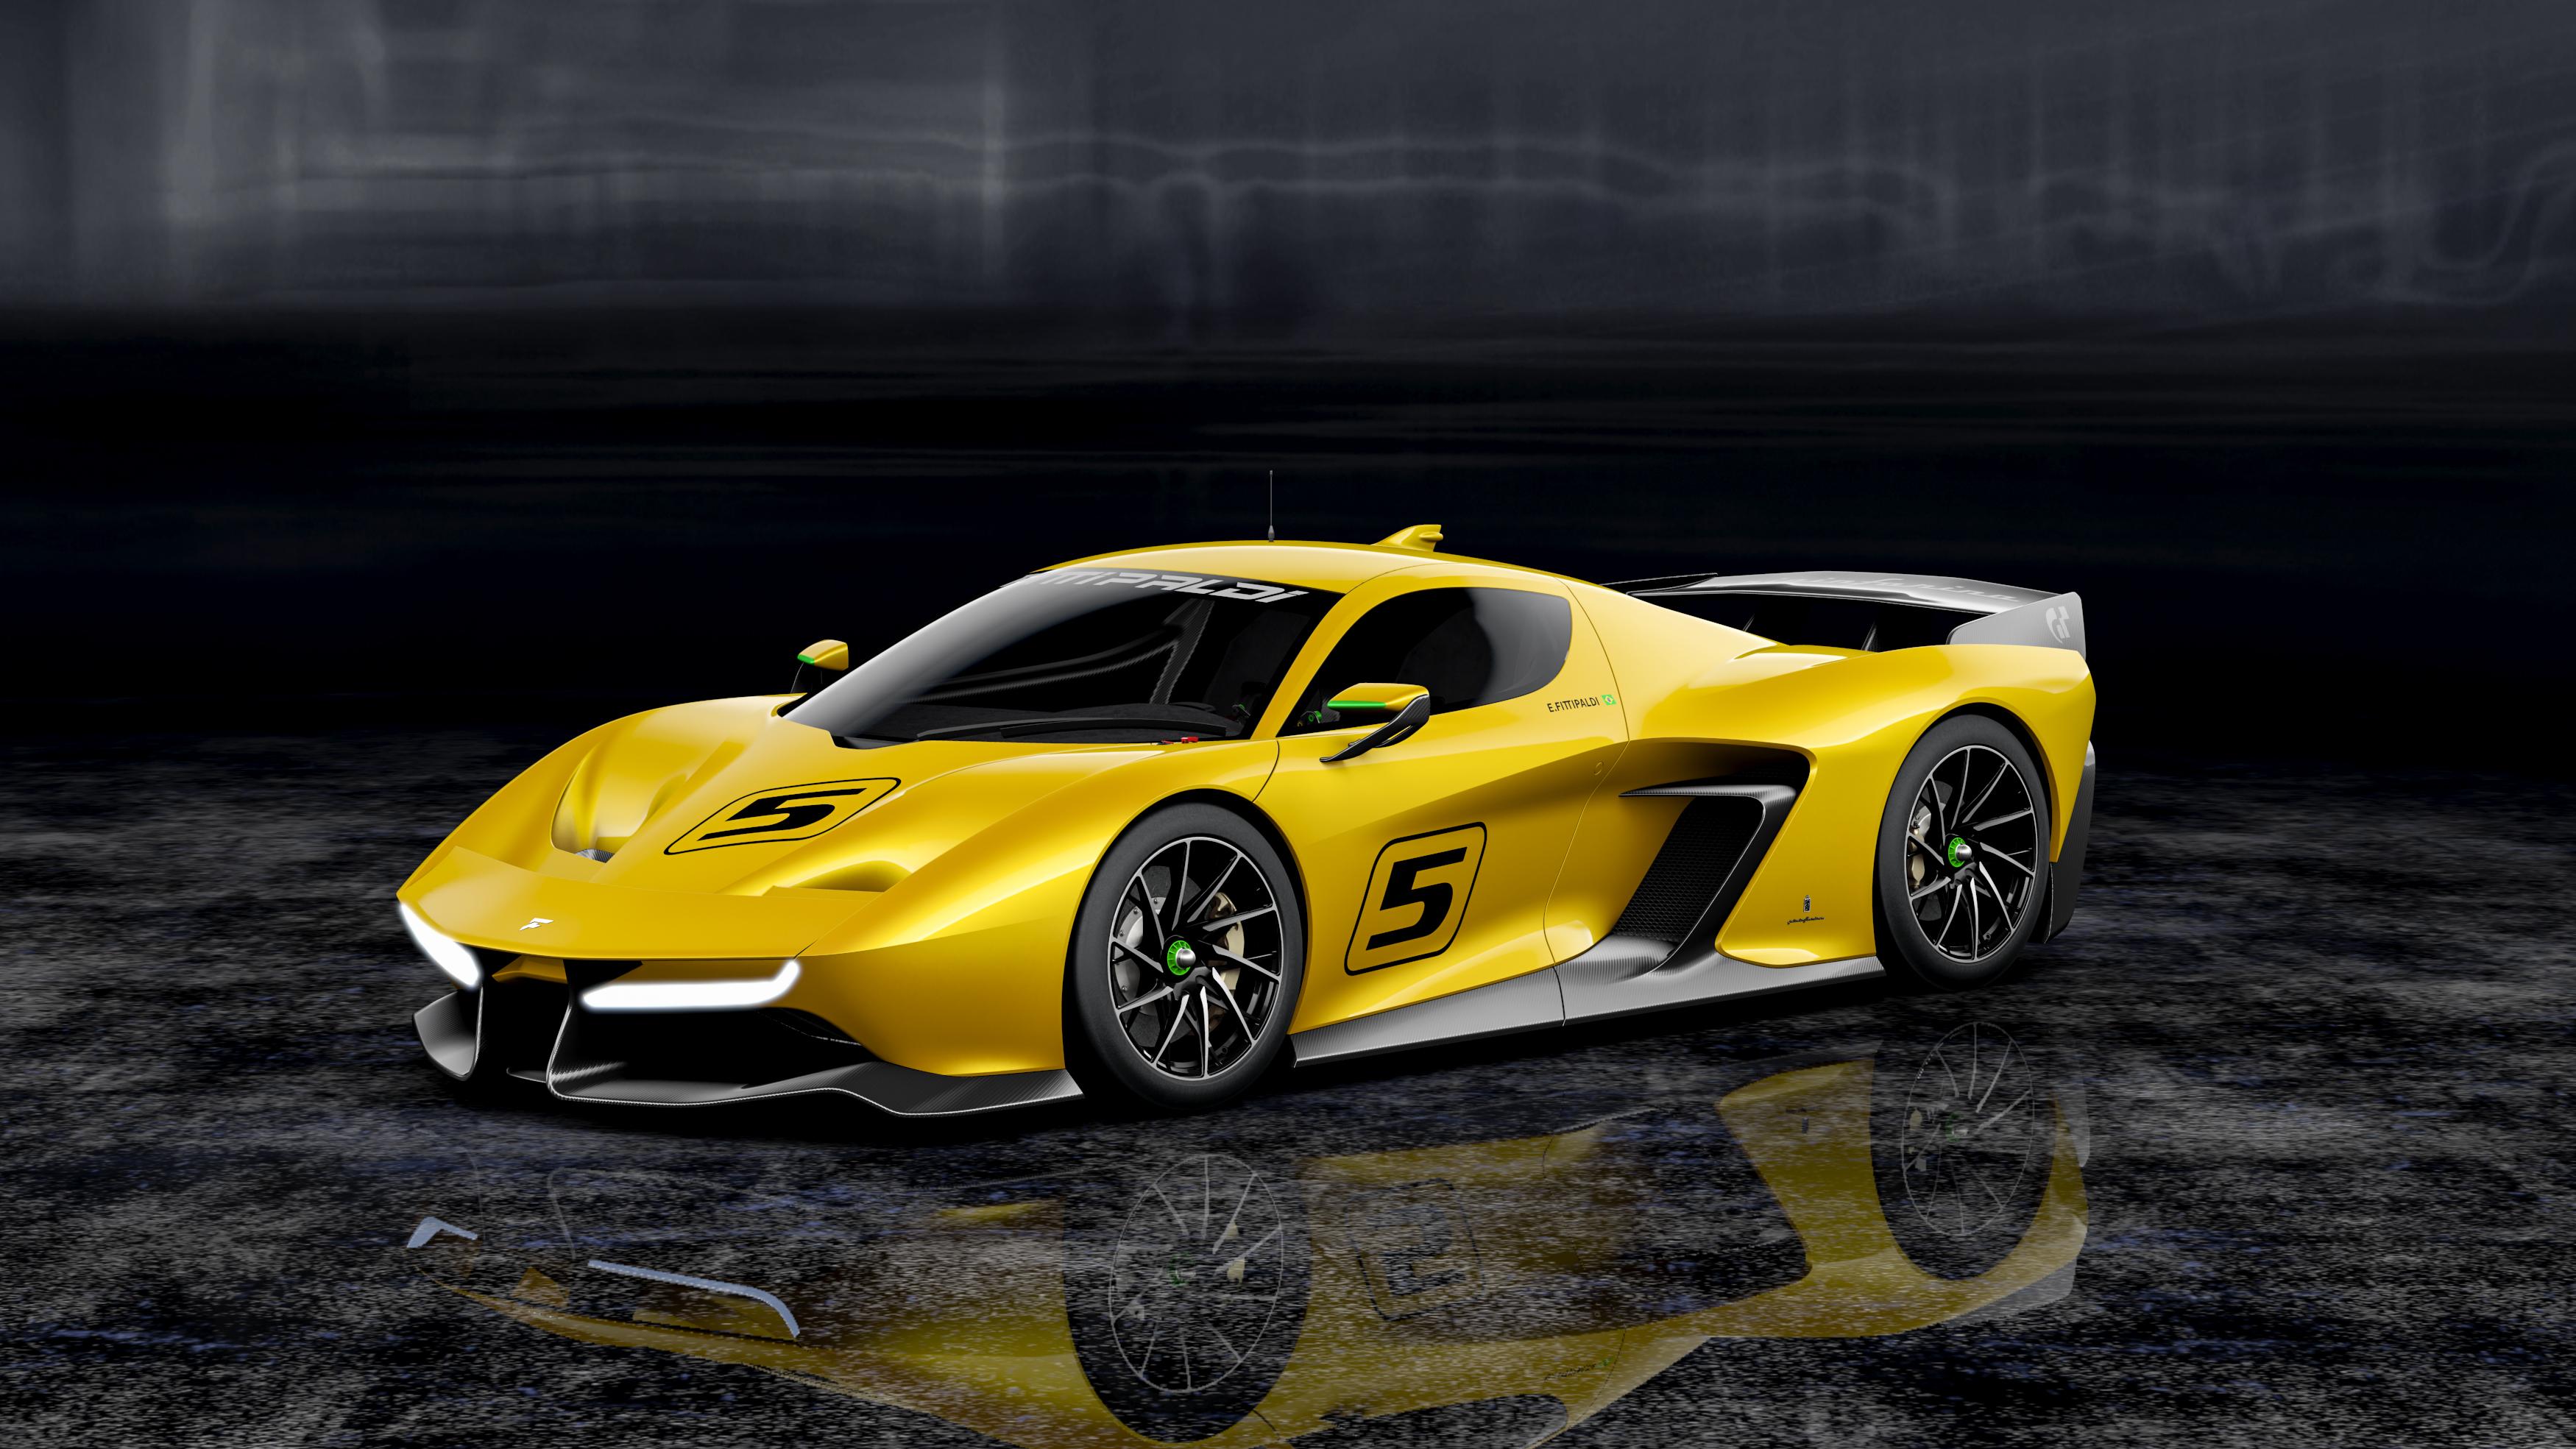 Fittipaldi EF7 Vision Gran Turismo by Pininfarina unveiled at Geneva Motor Show